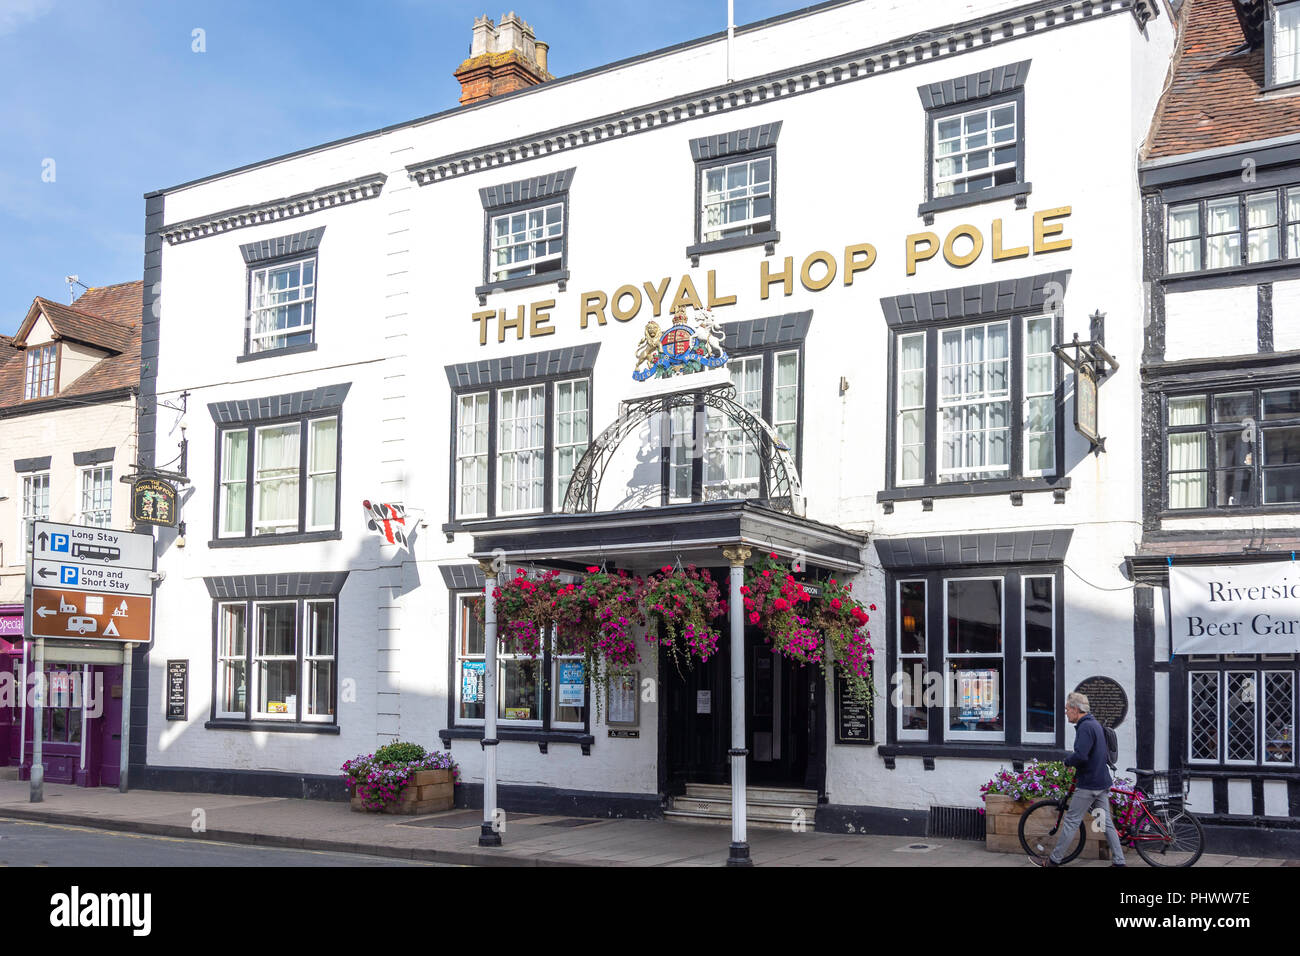 15th century The Royal Hop Pole Inn, Church Street, Tewkesbury, Gloucestershire, England, United Kingdom - Stock Image